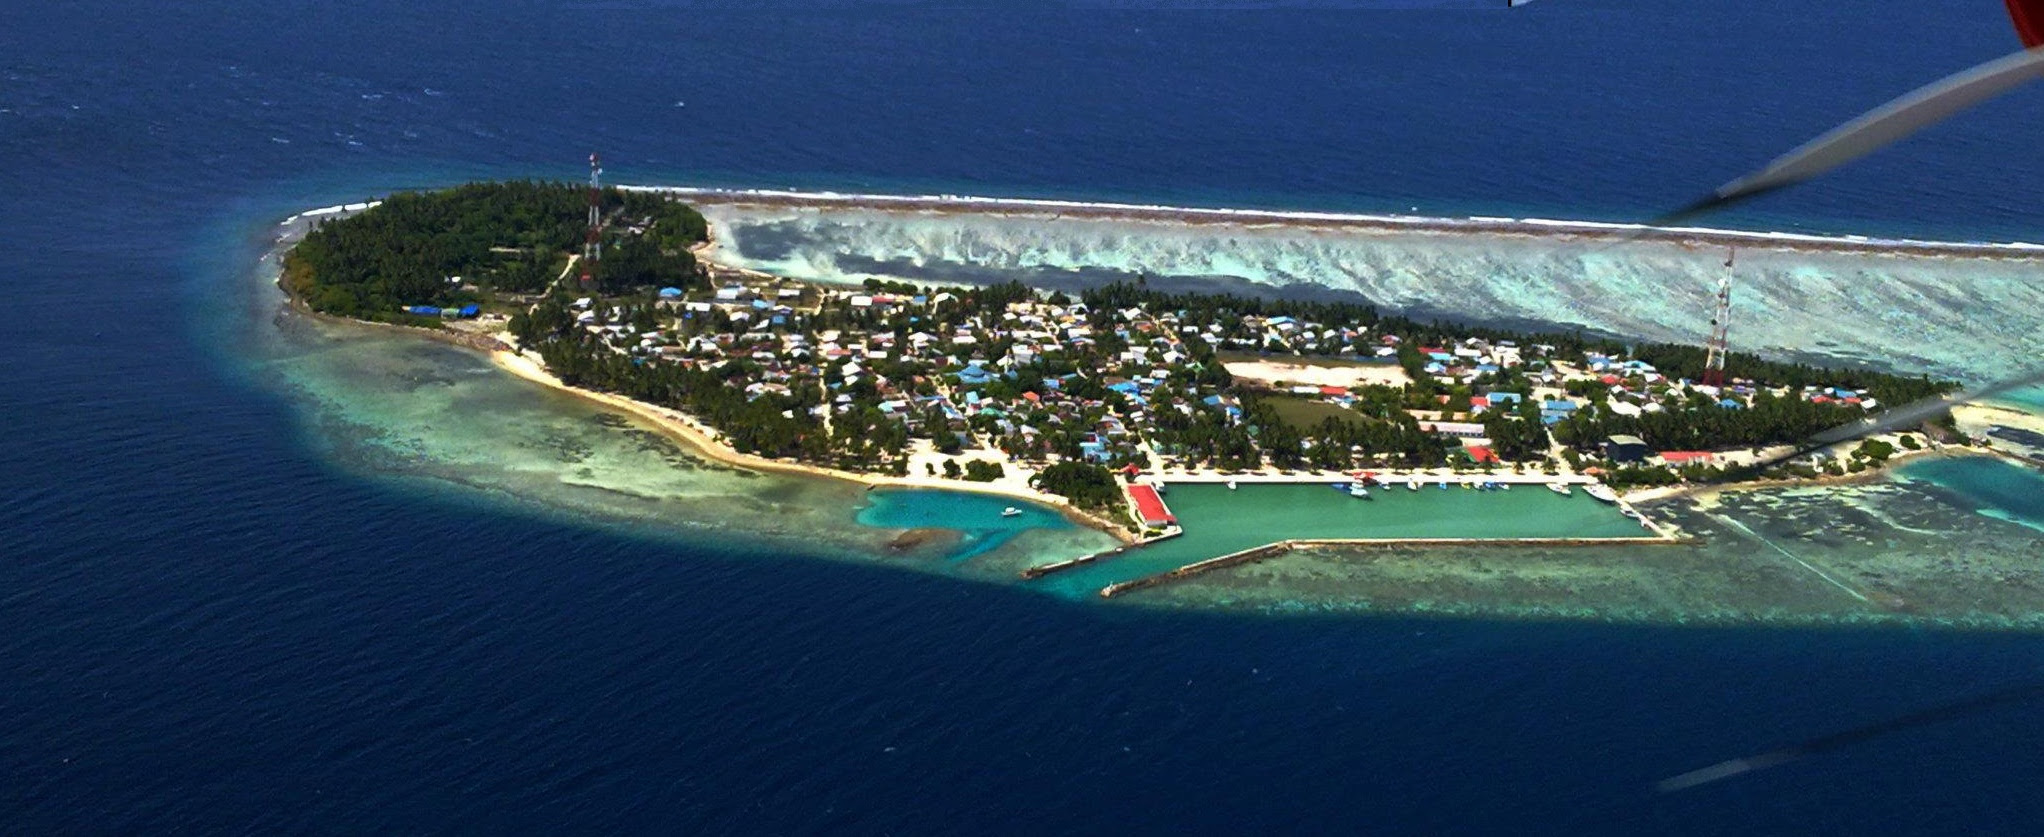 Kết quả hình ảnh cho guraidhoo island maldives